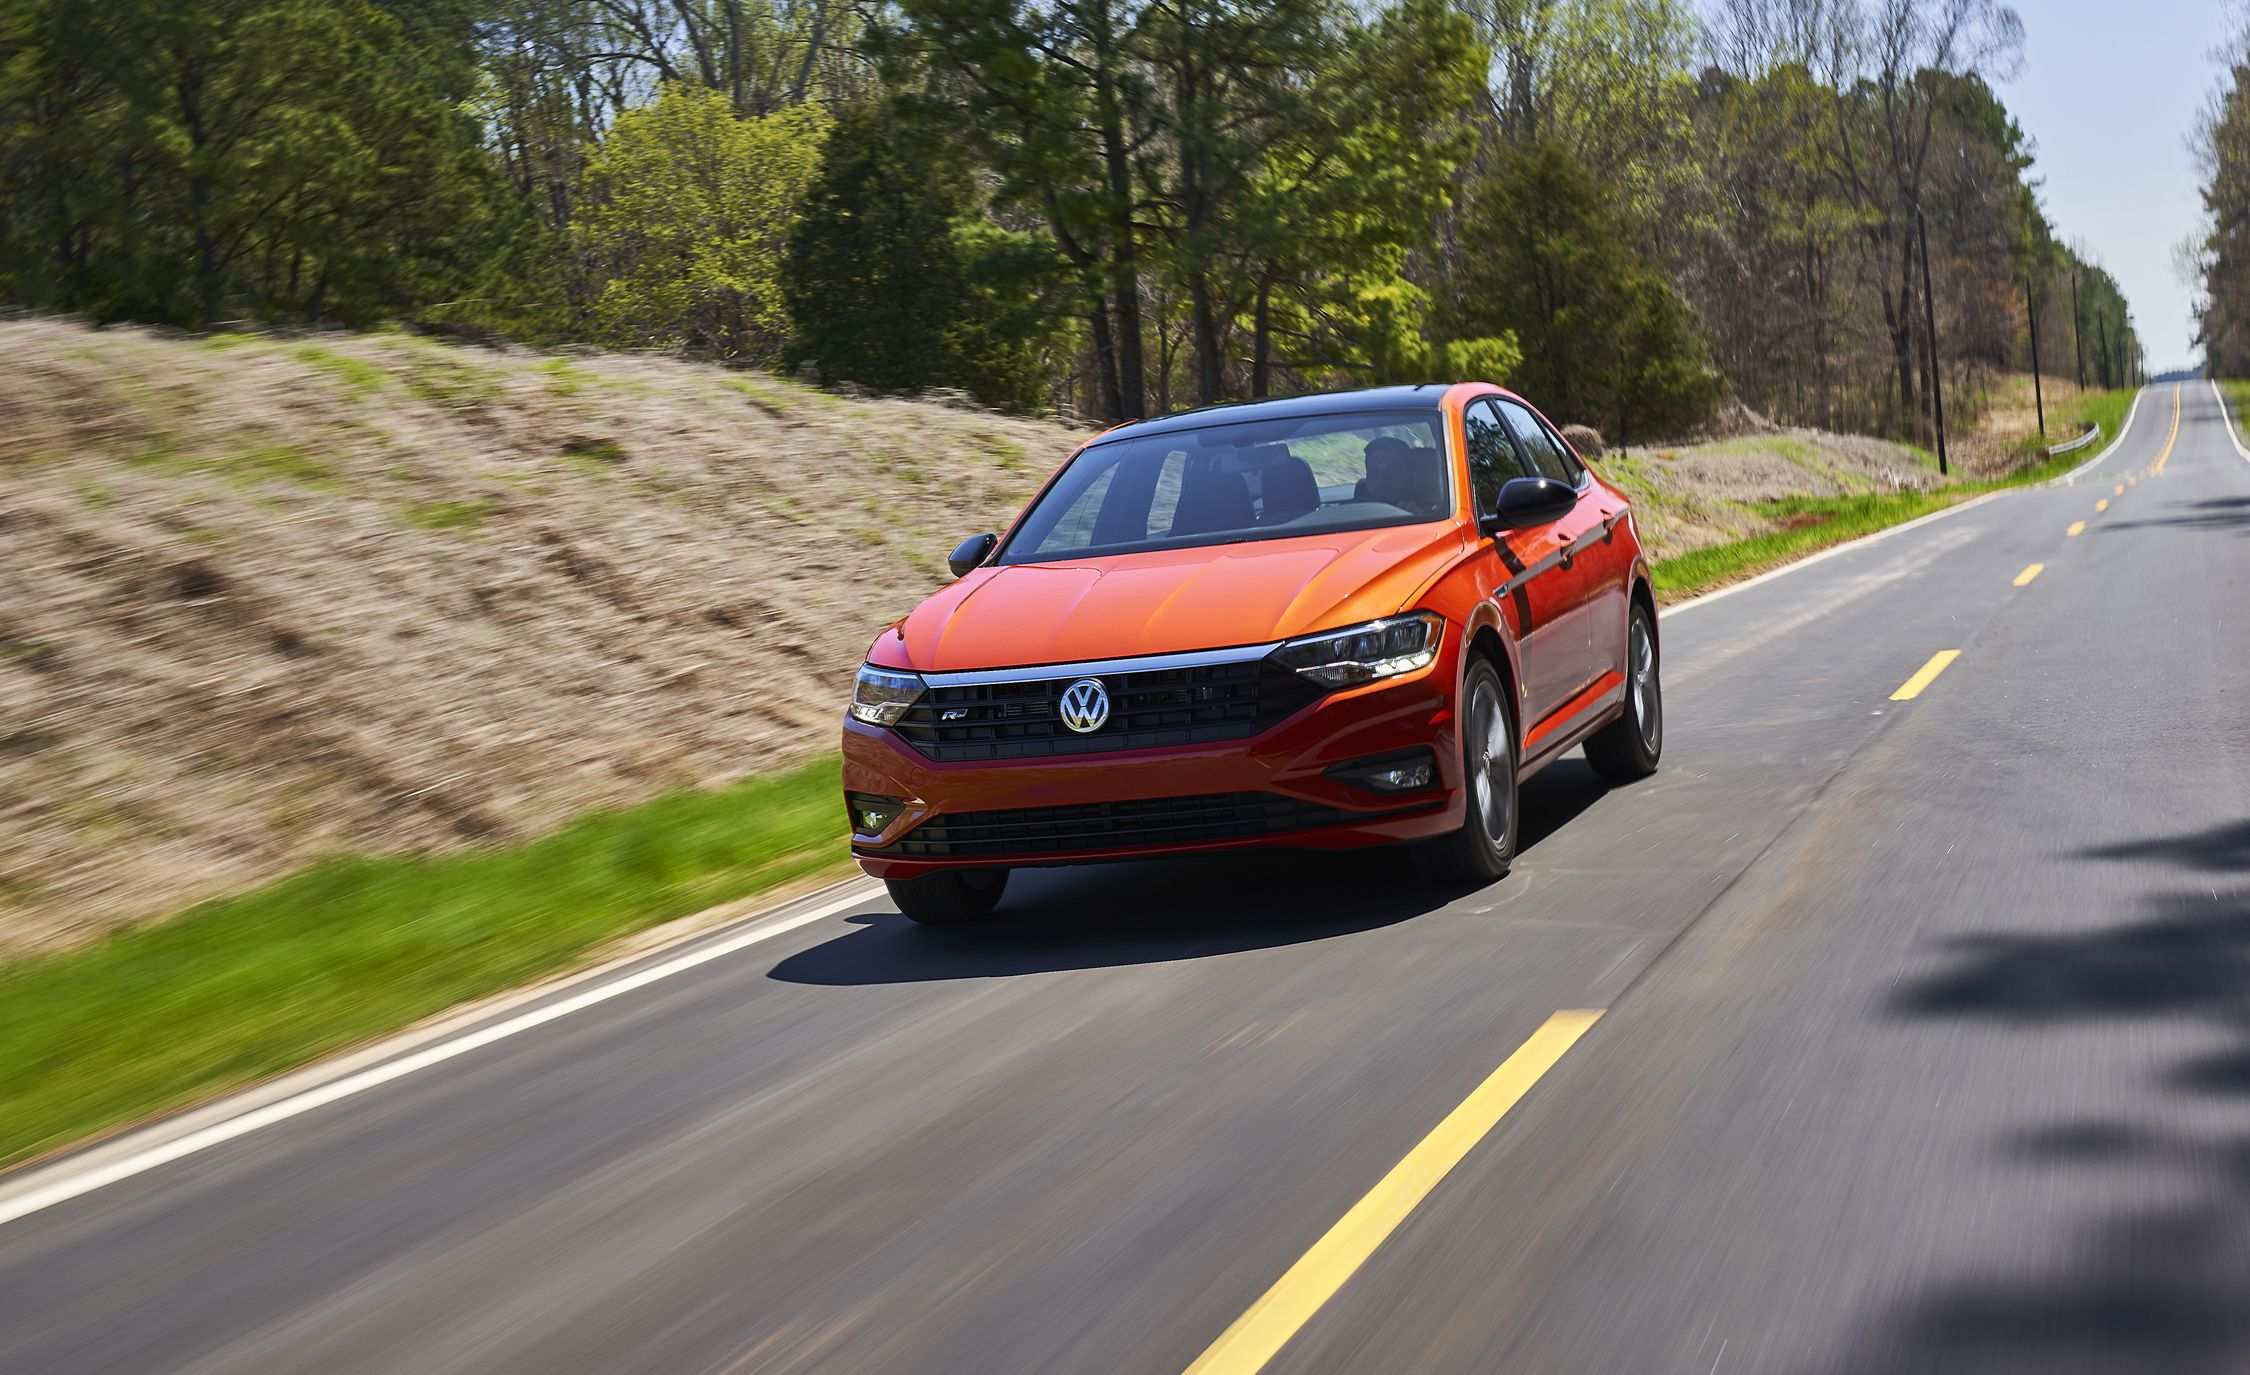 48 Gallery of New Volkswagen Jetta Gli 2019 Redesign And Concept Prices for New Volkswagen Jetta Gli 2019 Redesign And Concept